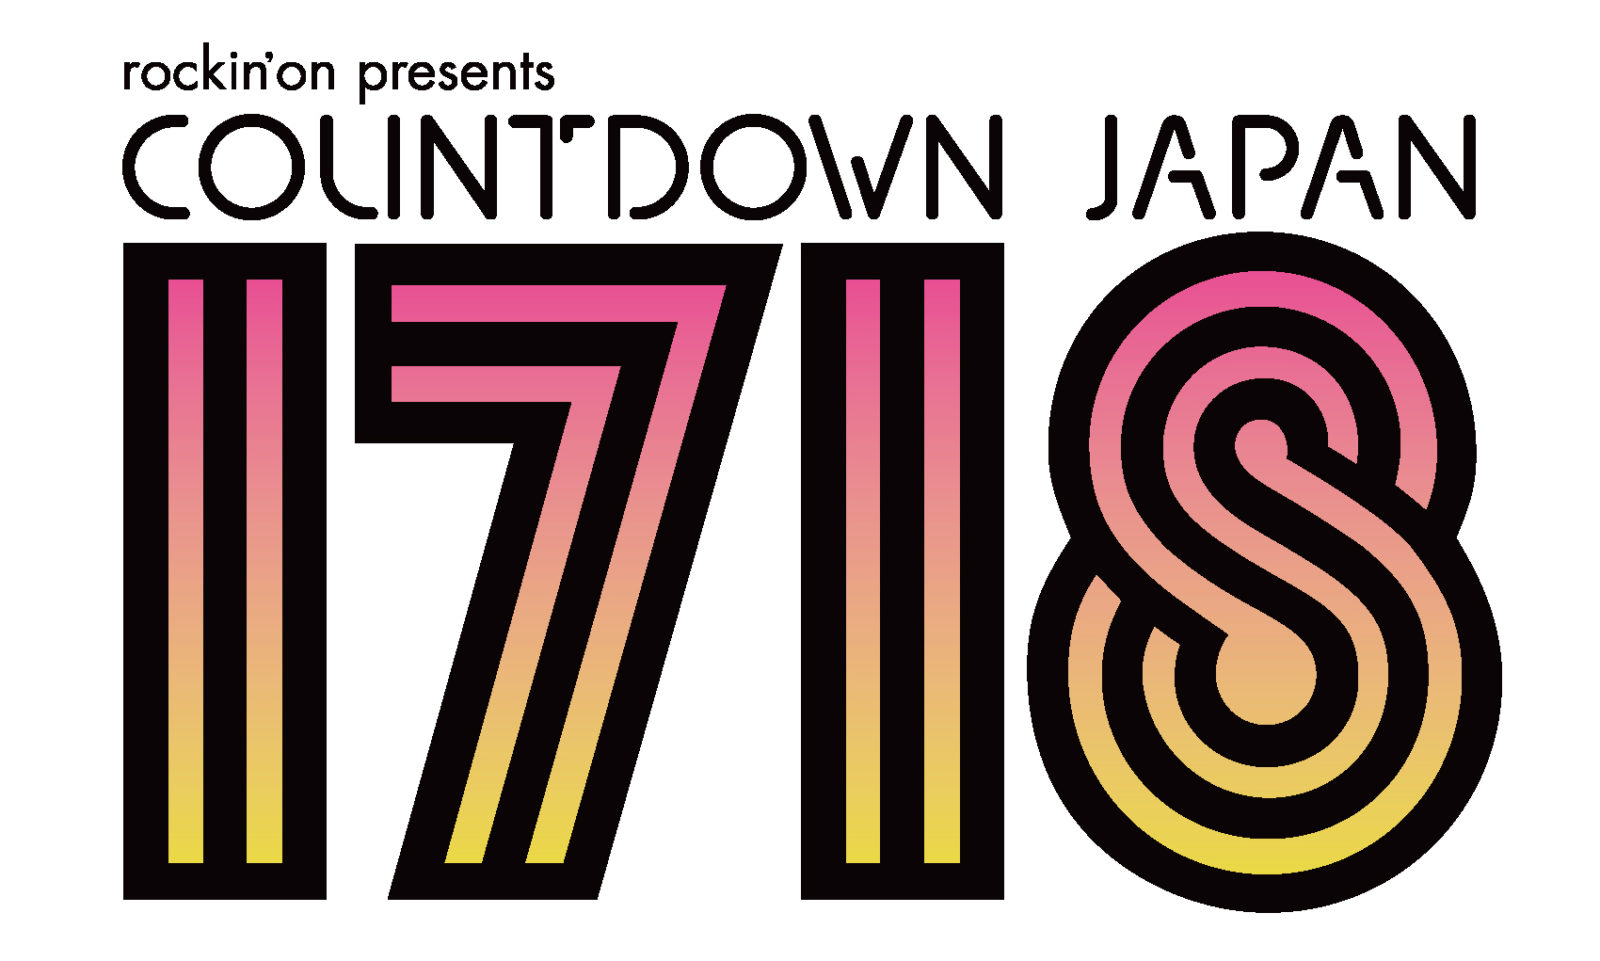 『COUNTDOWN JAPAN 17/18』WOWOWで2月に独占放送決定サムネイル画像